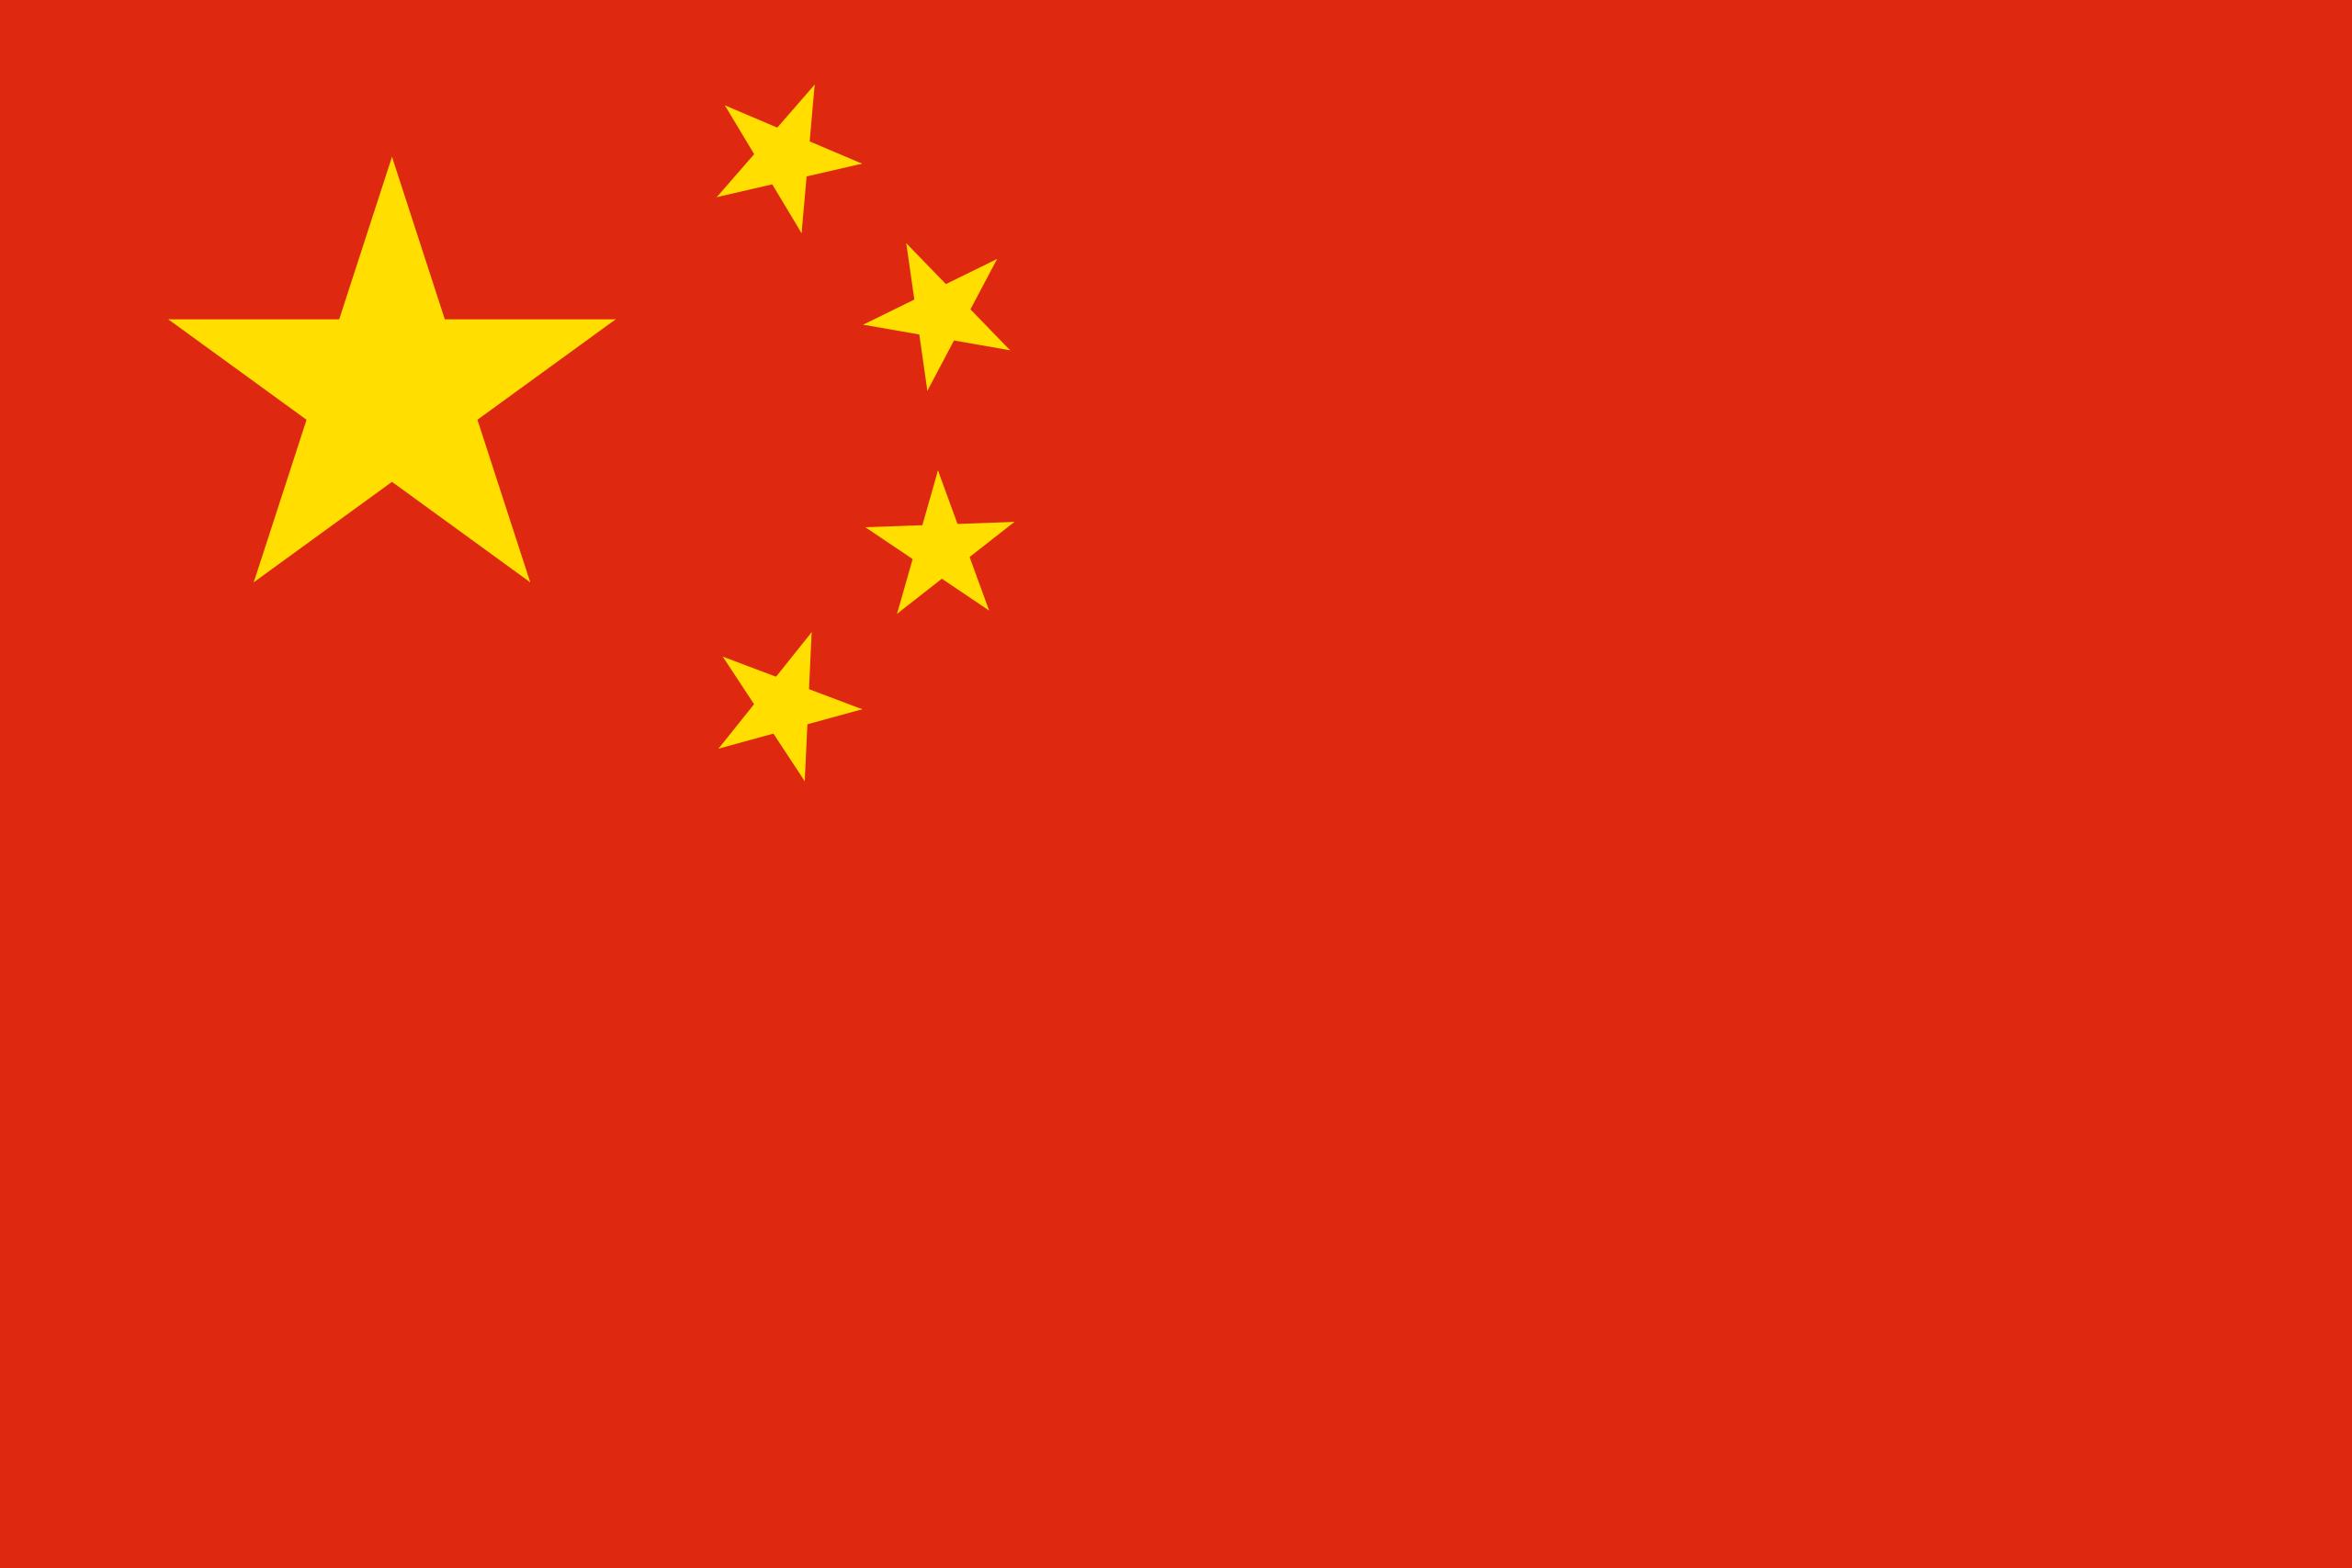 china, 国家, 会徽, 徽标, 符号 - 高清壁纸 - 教授-falken.com